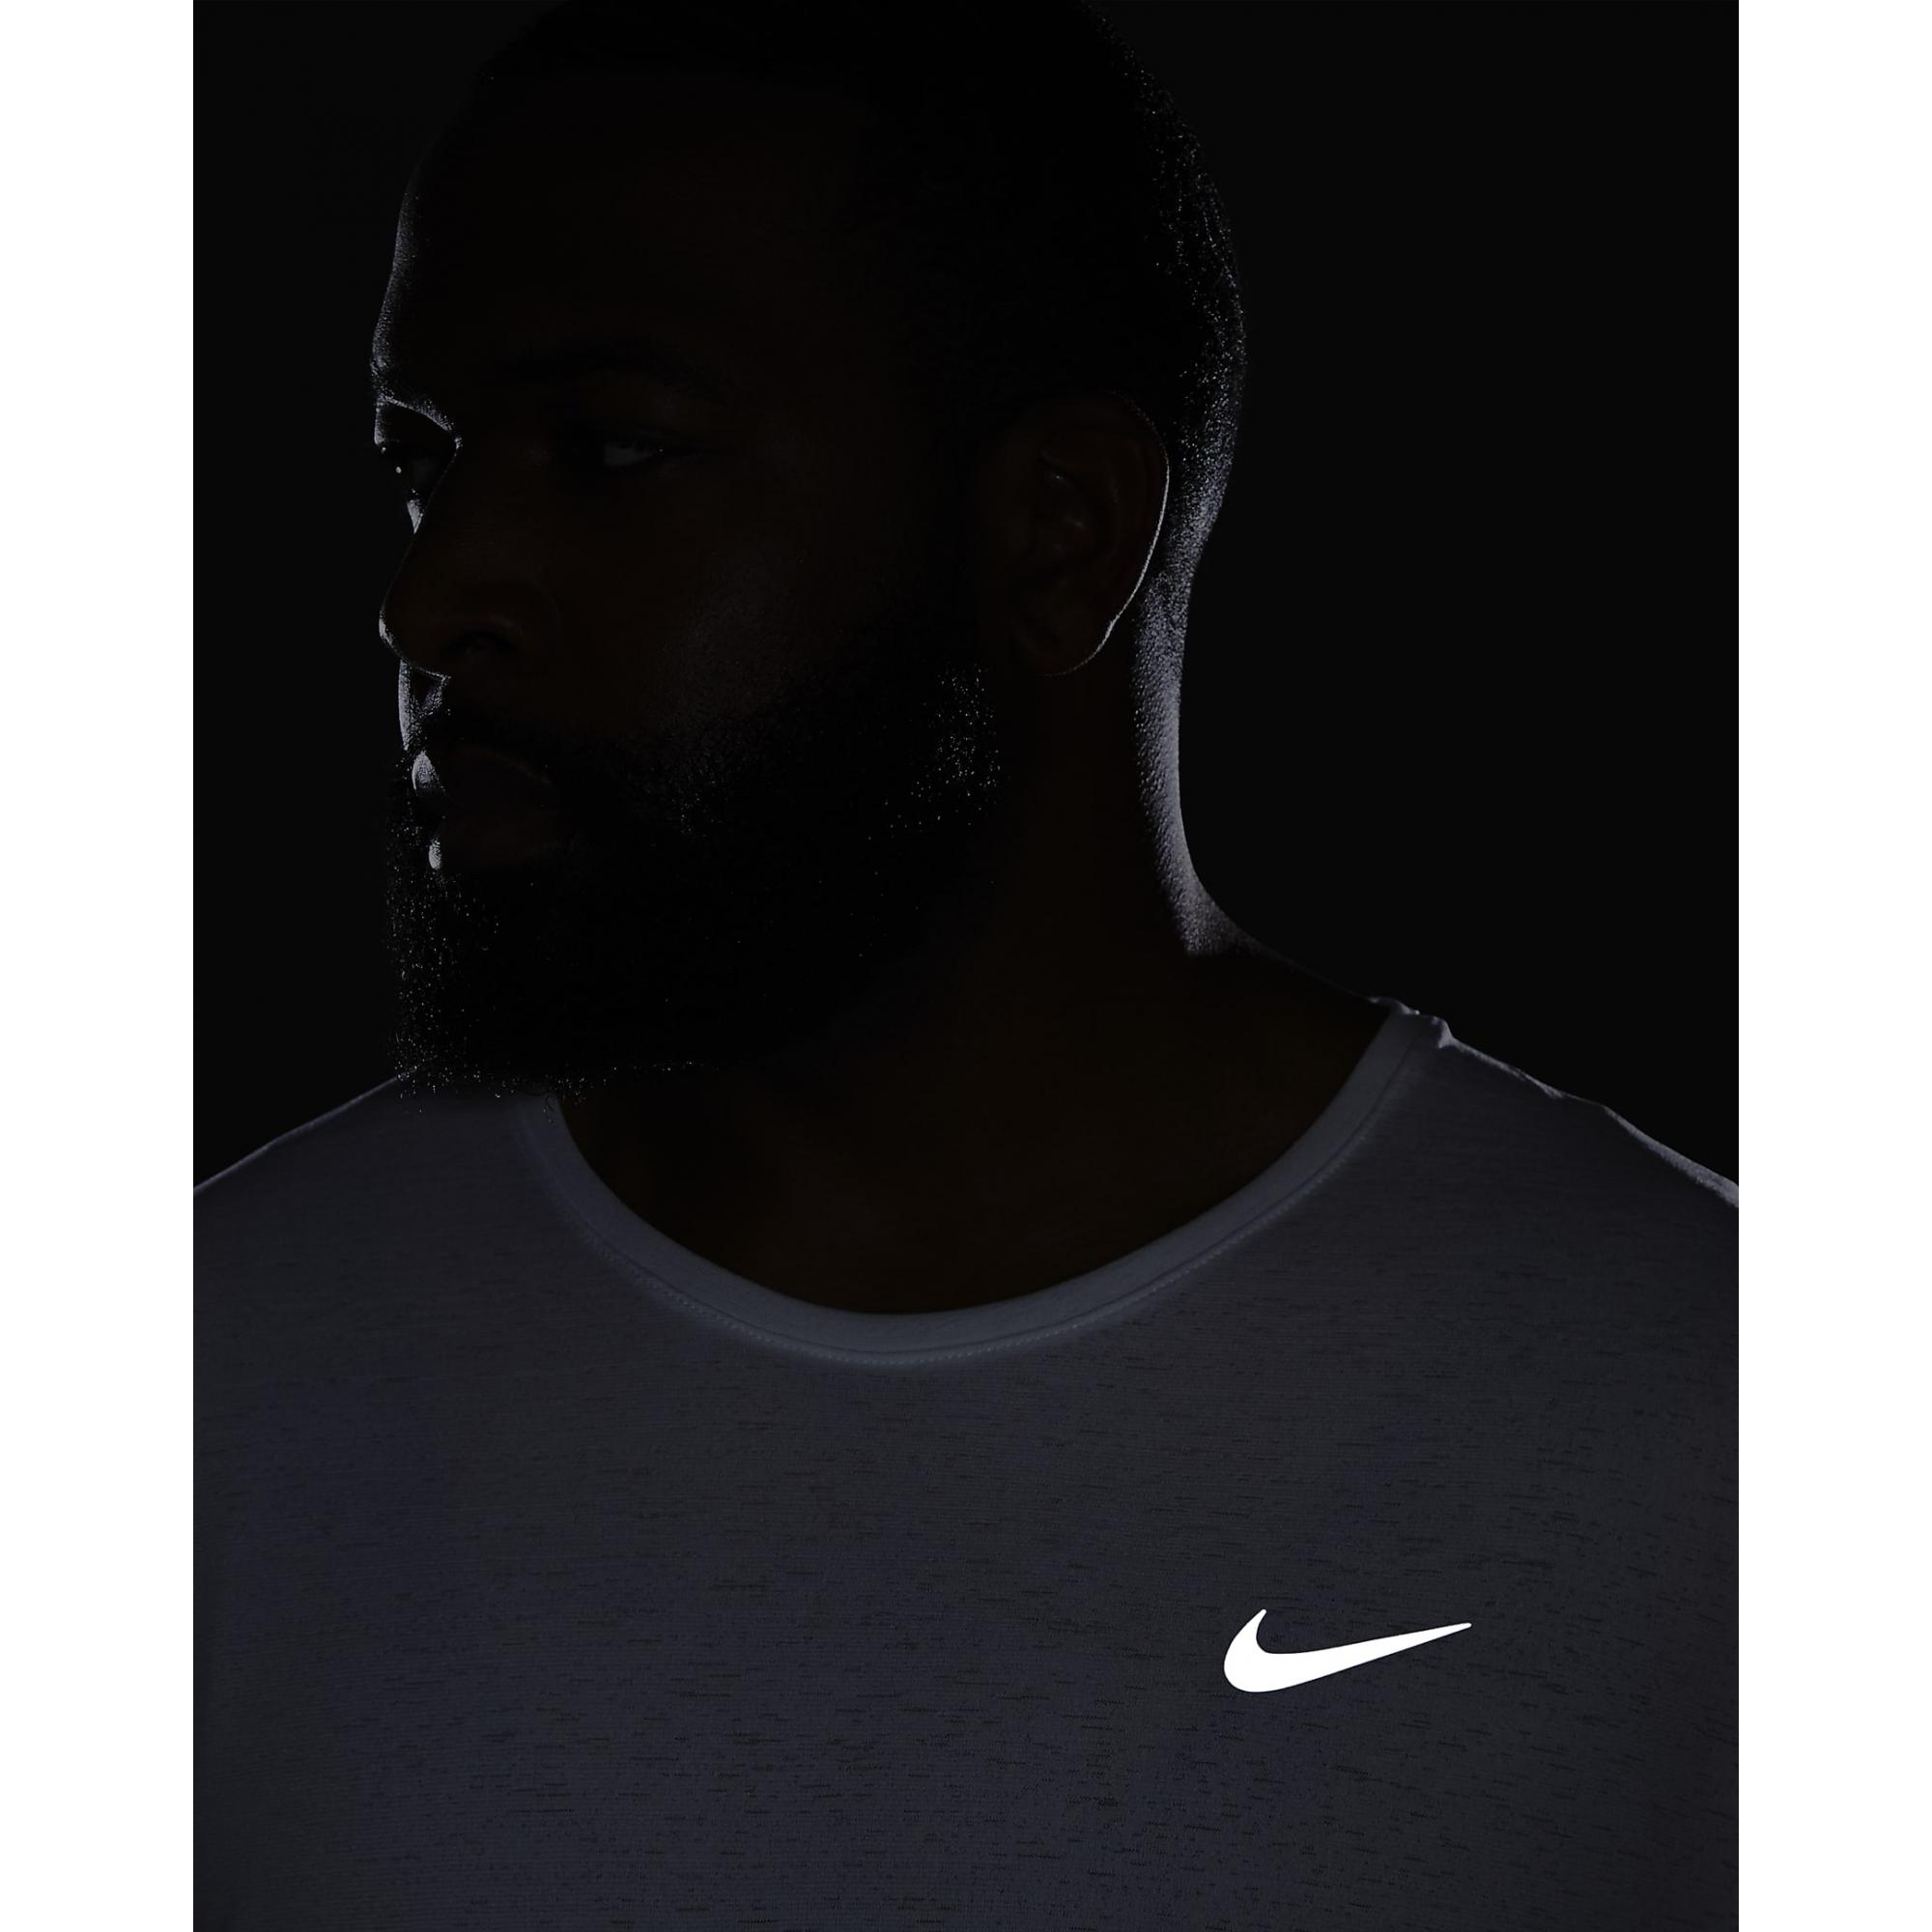 Camiseta Nike Dri-Fit Miler Masculino Branco